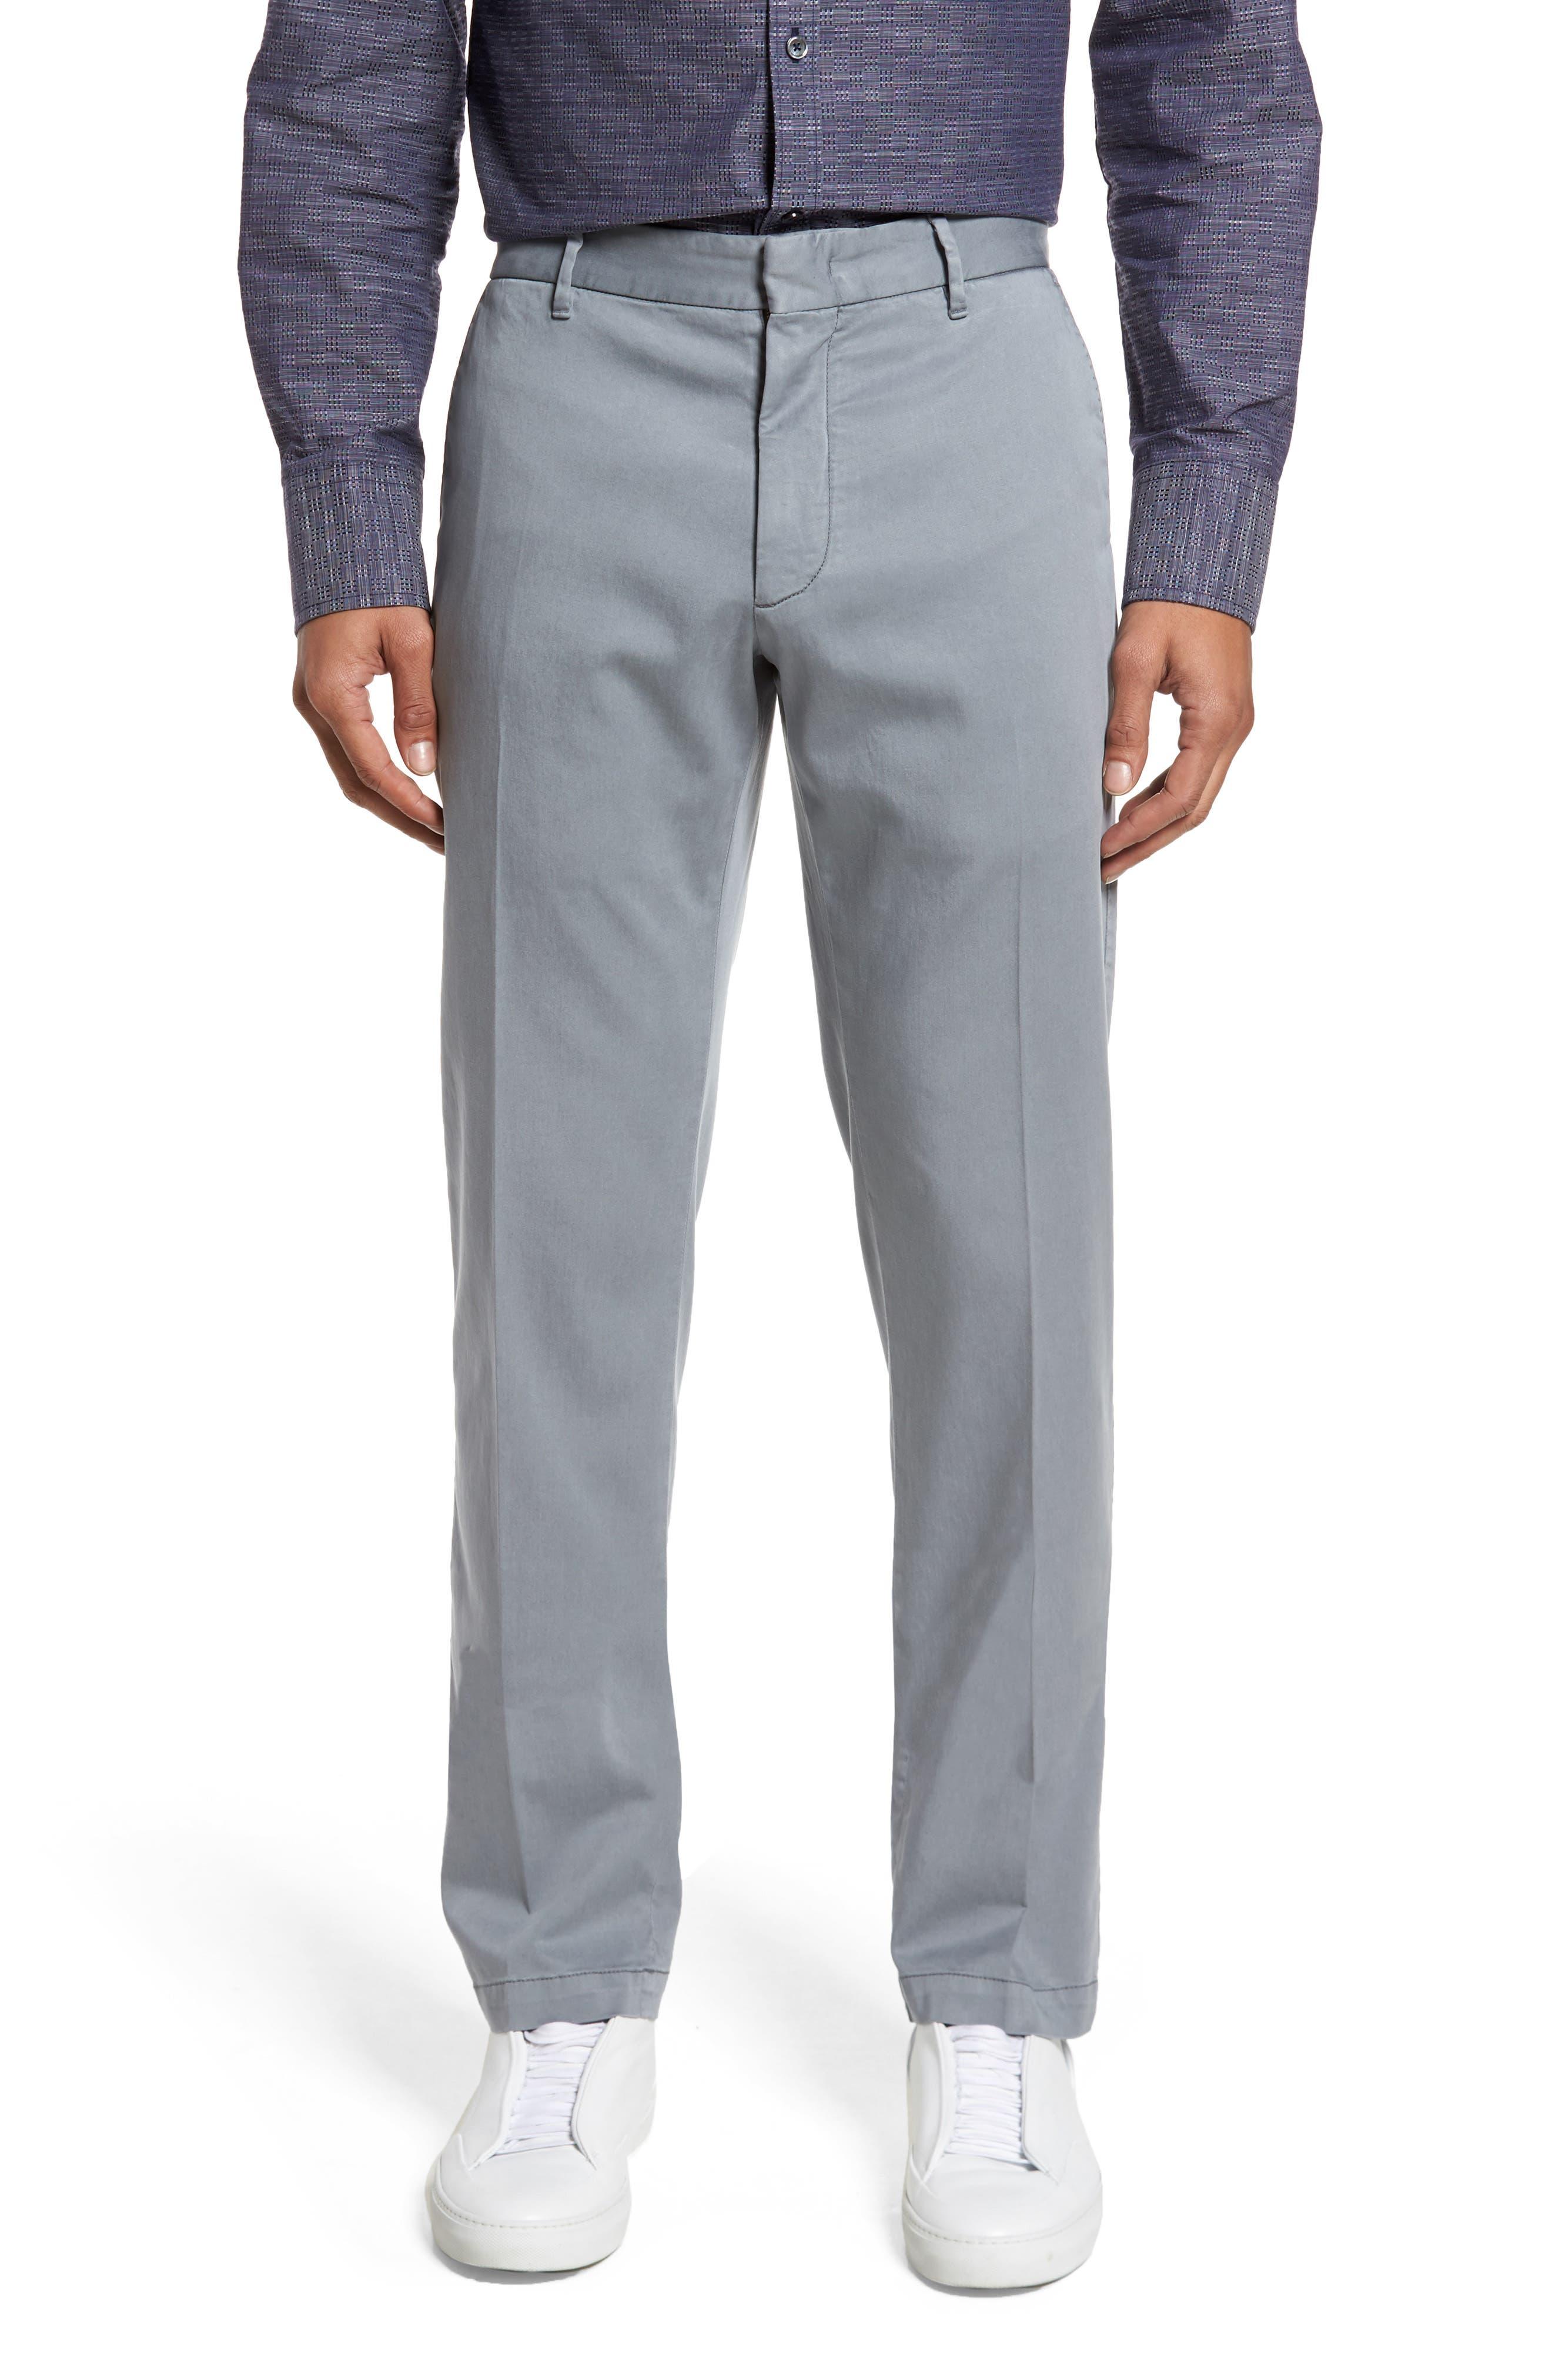 Aster Straight Fit Pants,                             Main thumbnail 1, color,                             GREY